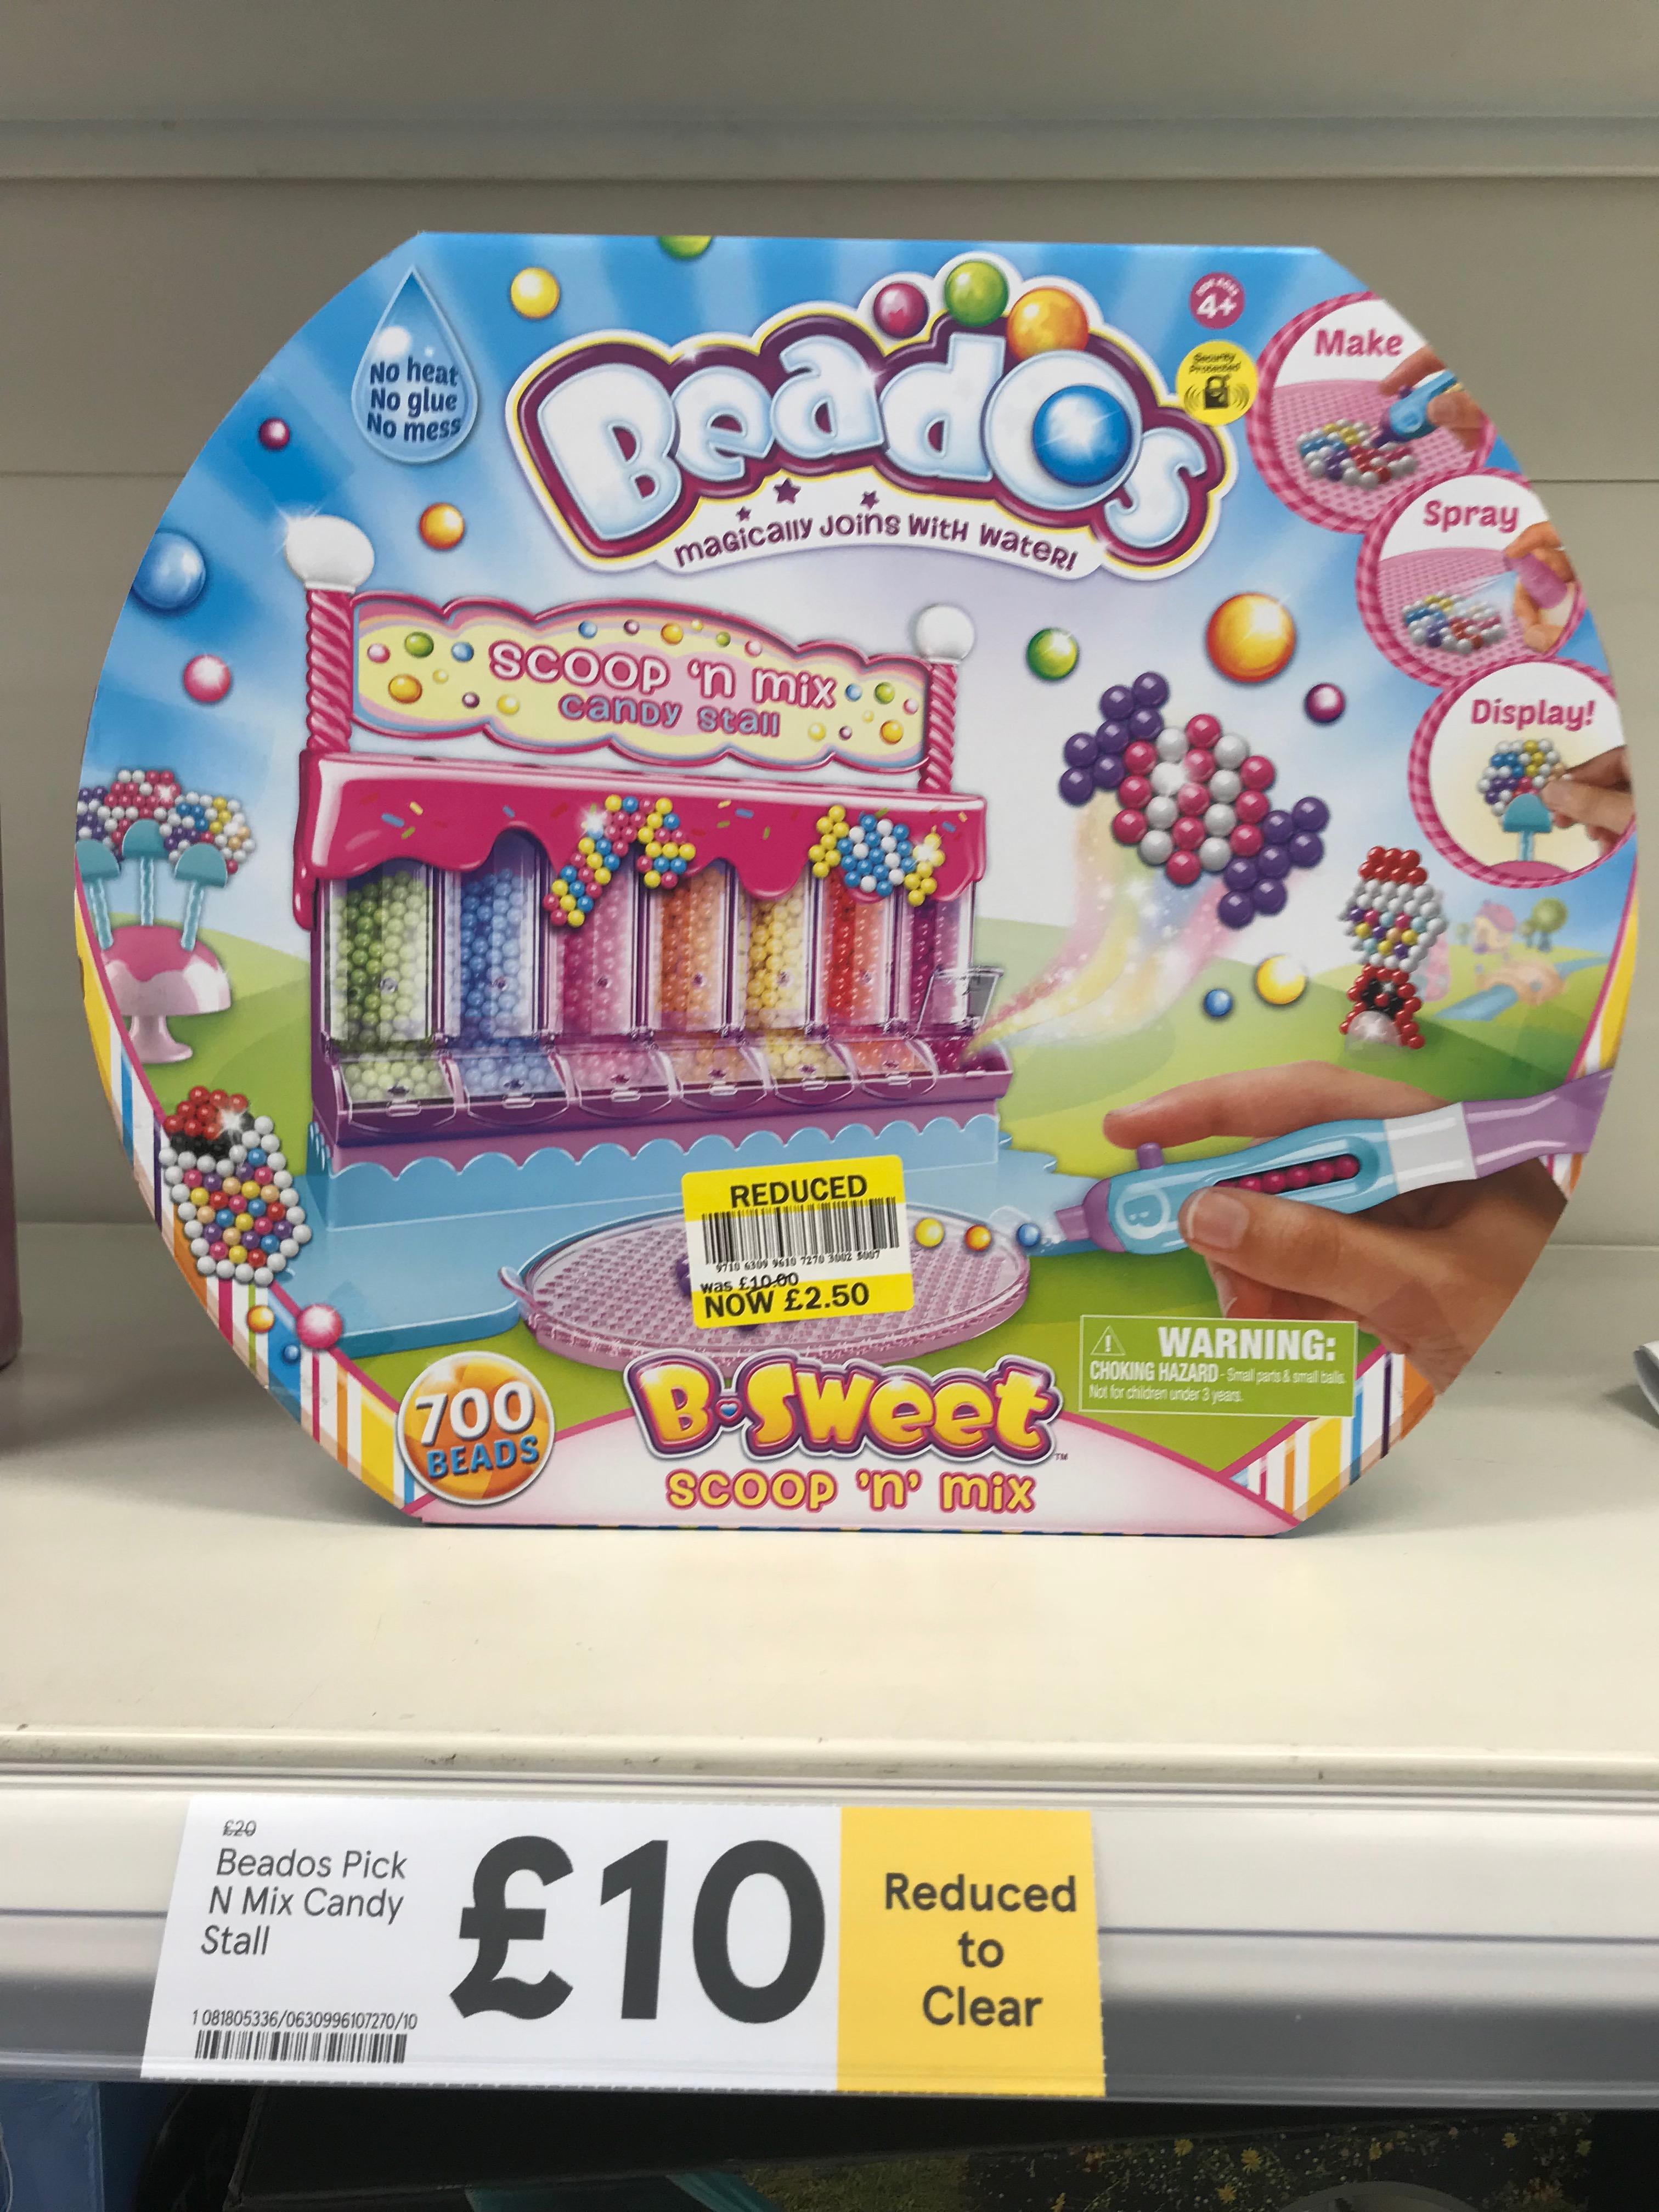 £2.50 In Store!! BEADOS PICK N MIX CANDY STALL Originally £20 at Tesco (Cheetham) - HotUKDeals